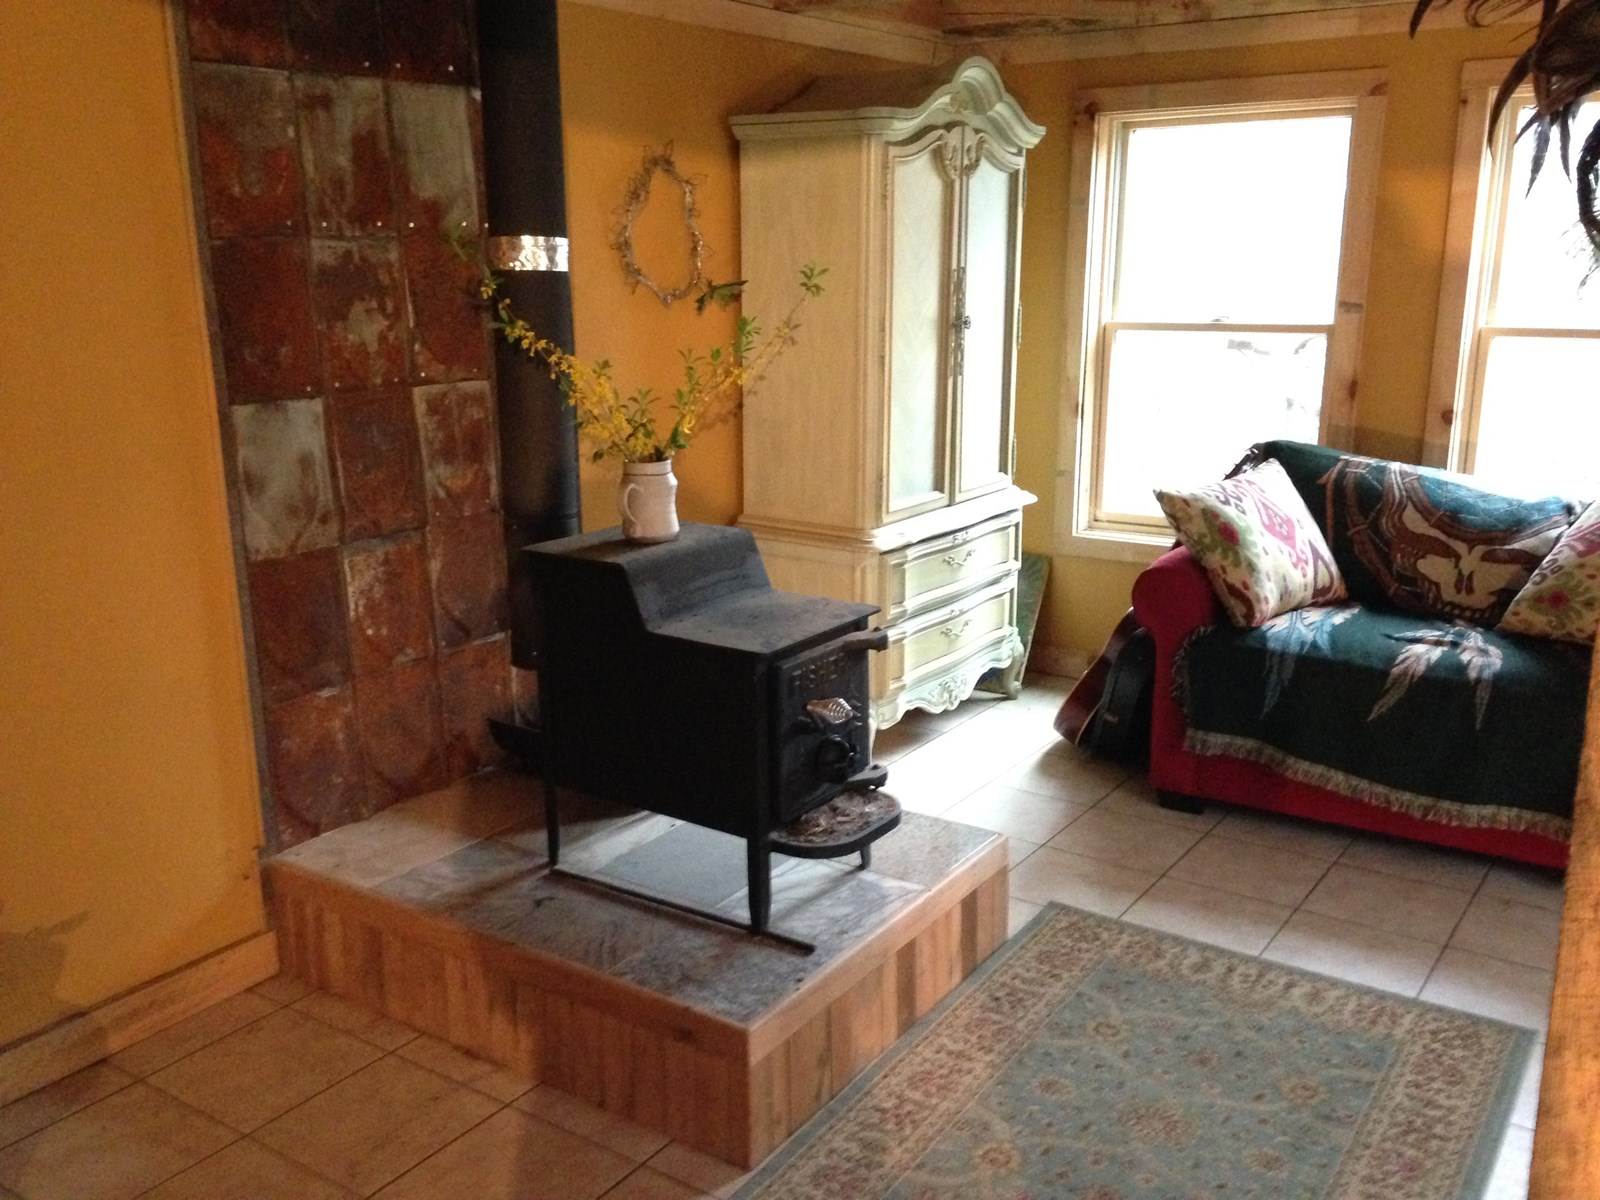 Offgrid Dwelling Amp Land For Sale Marshall Madison